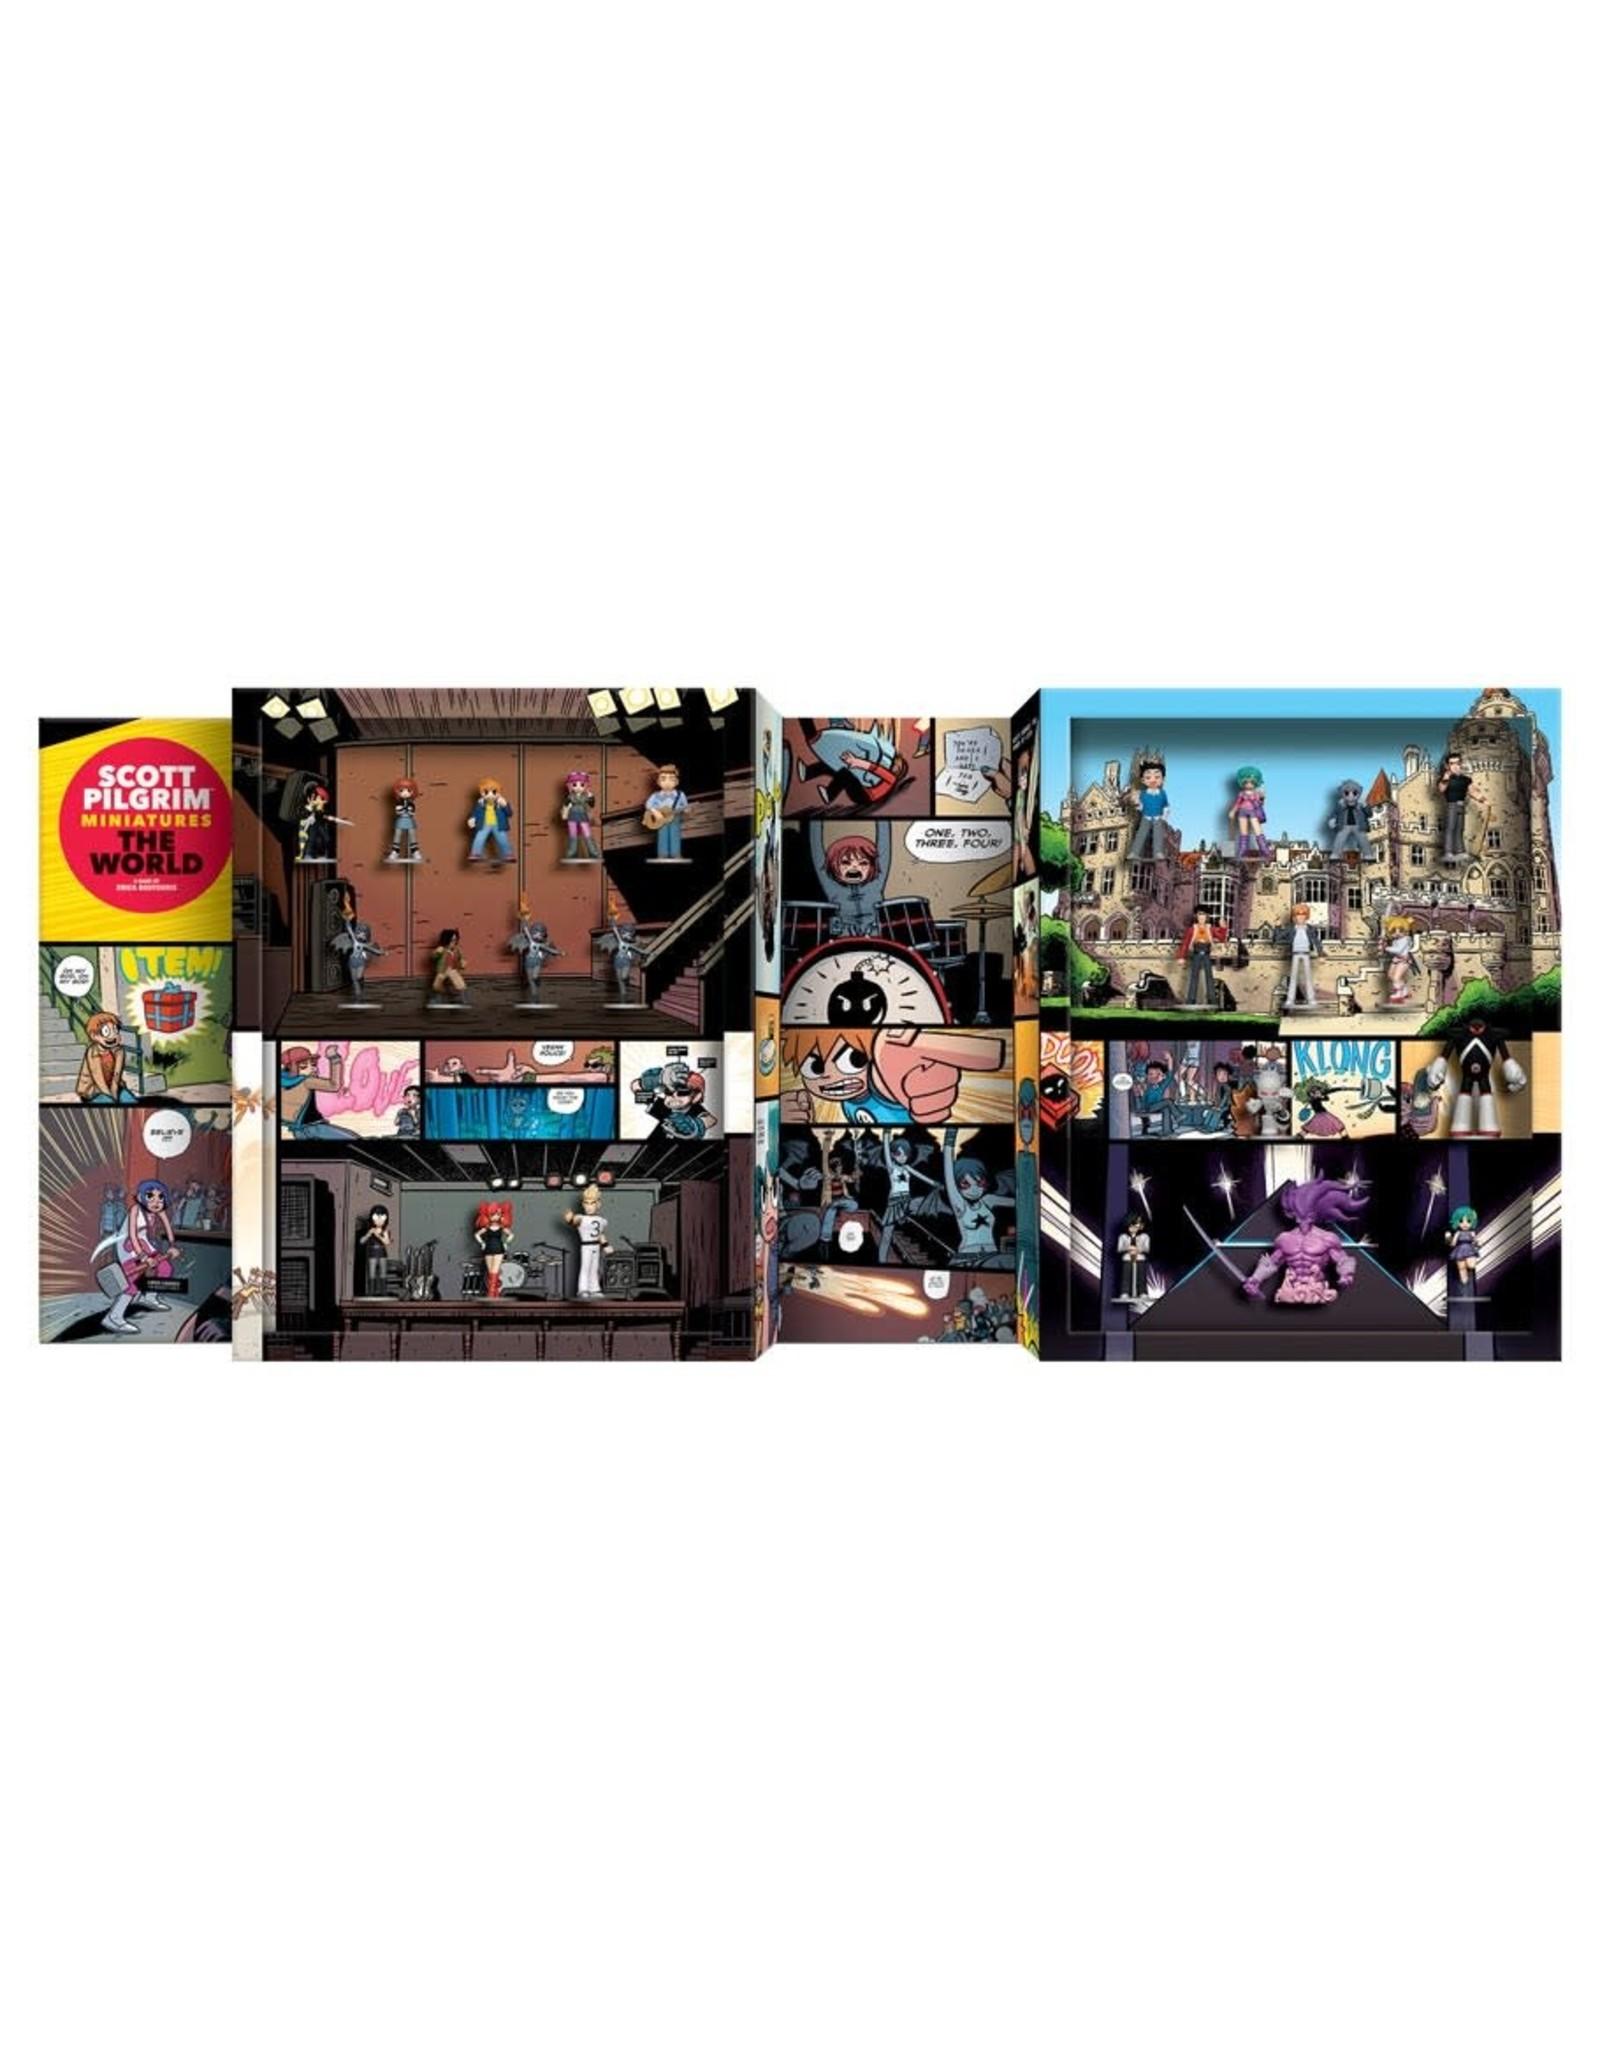 Renegade Scott Pilgrim Miniatures The World: Collectors Edition Figure Set